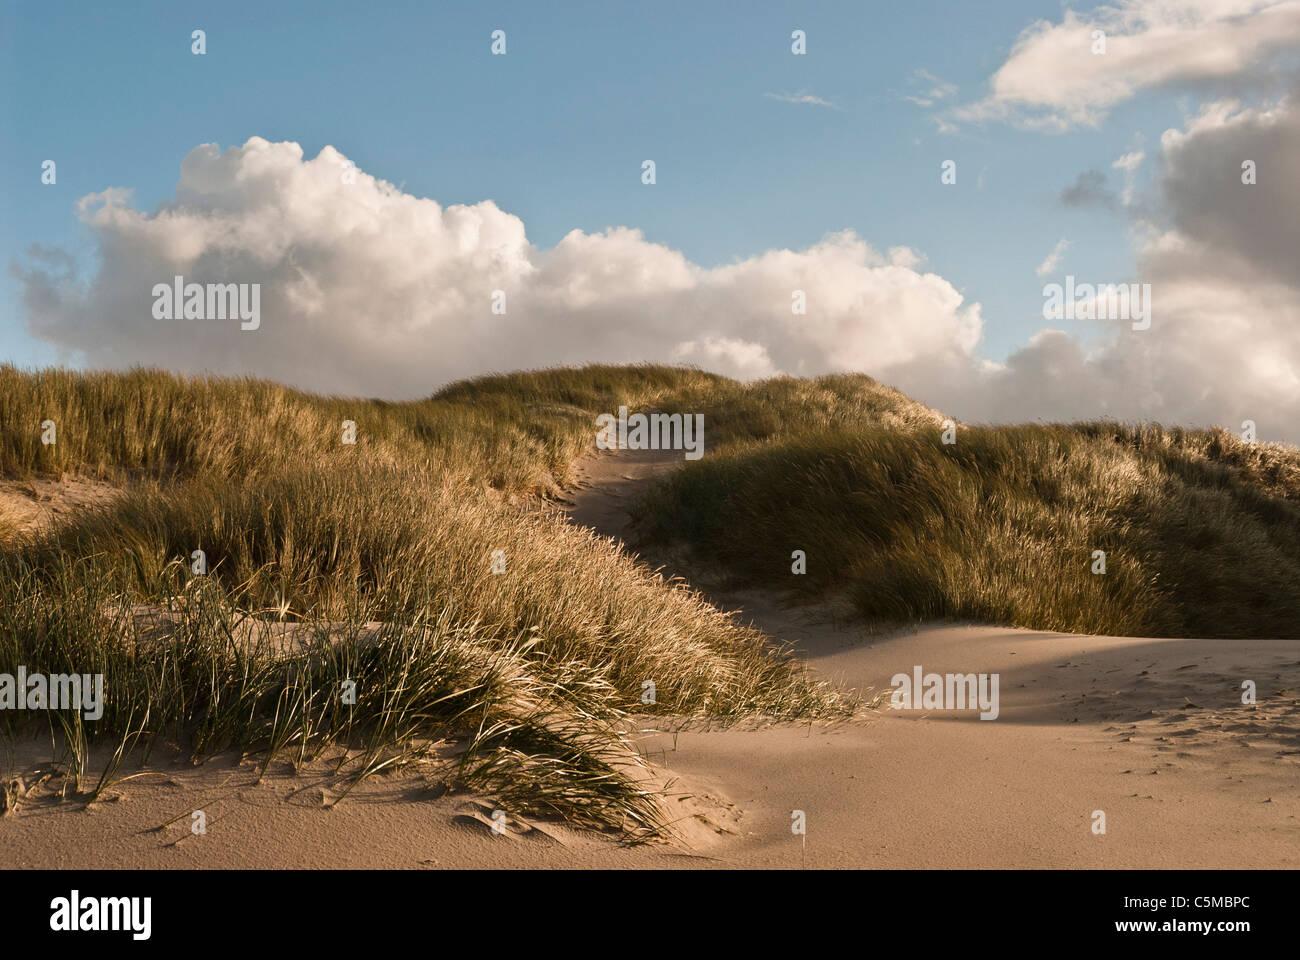 European Marram Grass, Ammophila arenaria, on a dune near the North Sea beach, Denmark - Stock Image